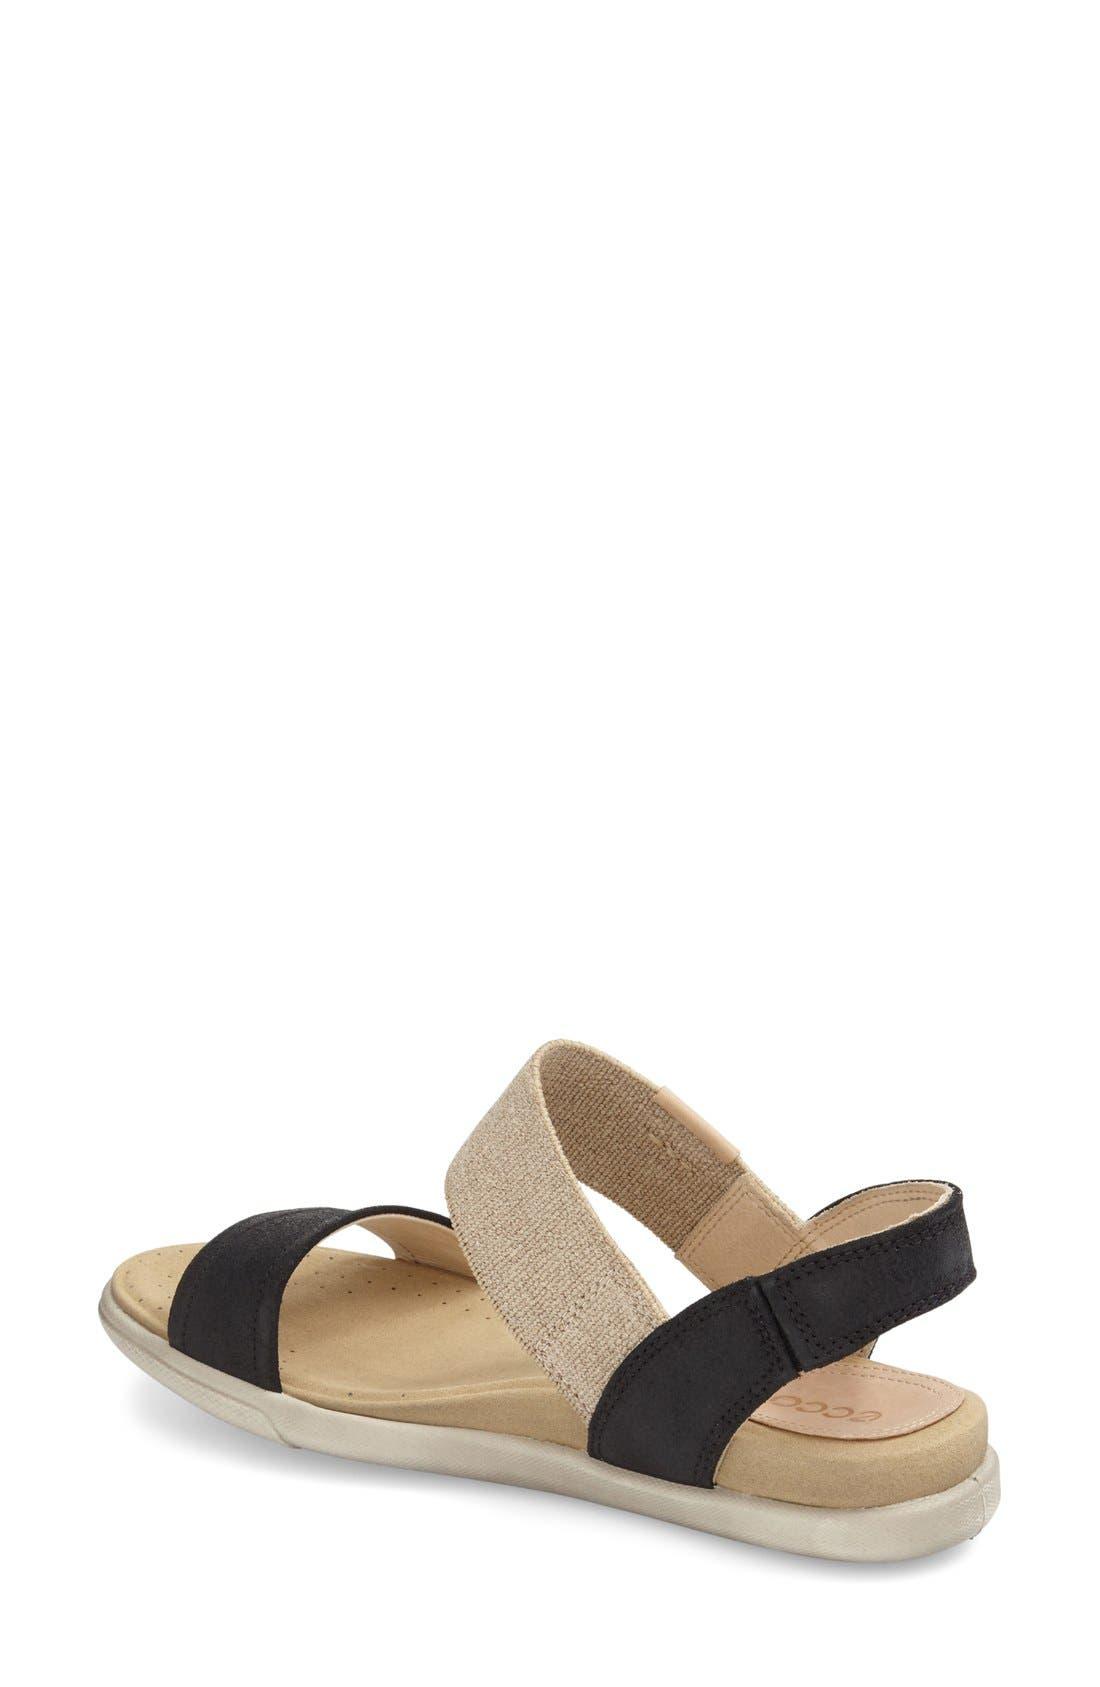 Alternate Image 2  - ECCO 'Damara' Sandal (Women)